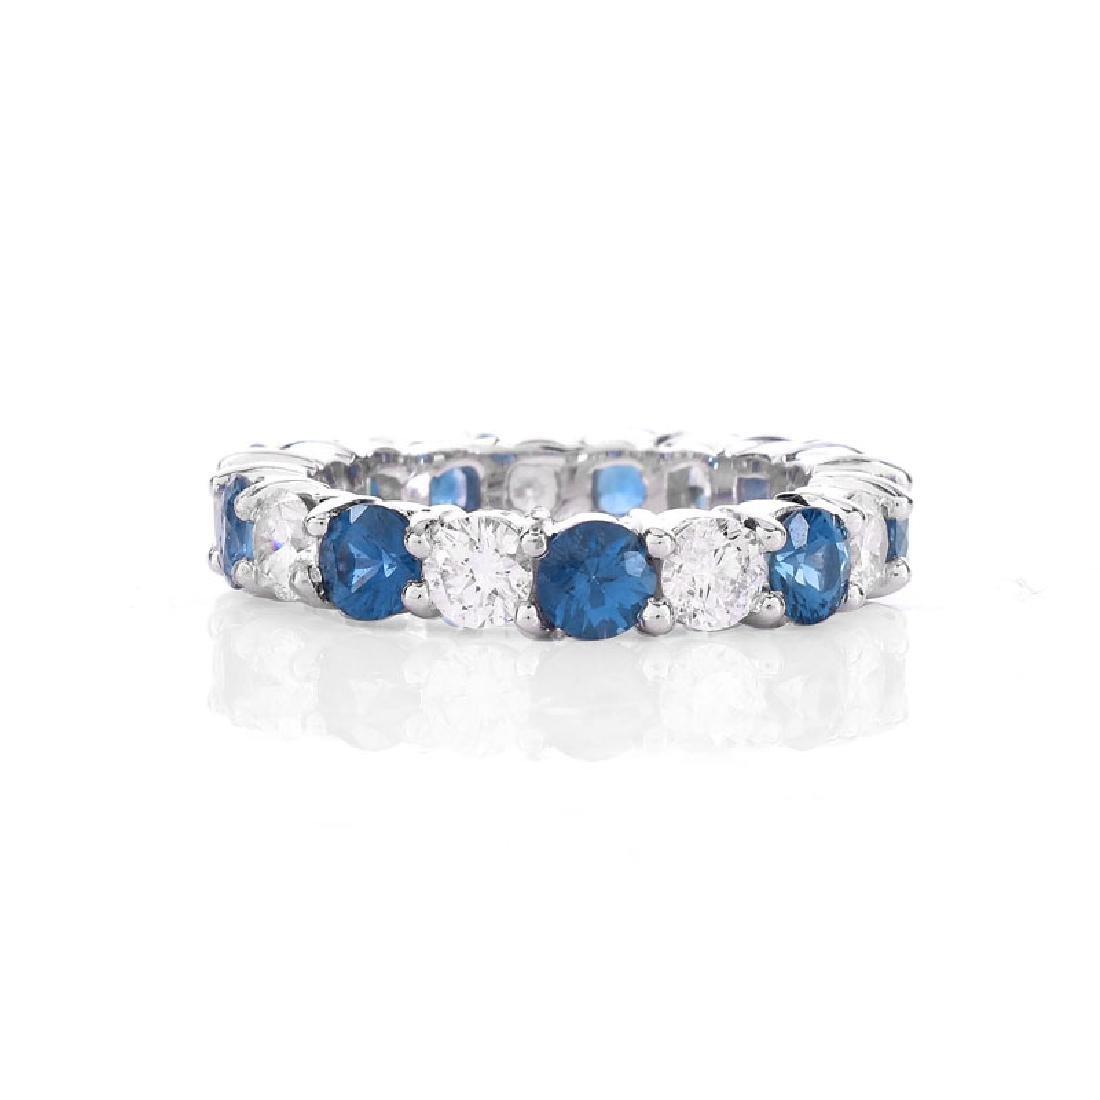 Approx. 2.62 Carat Round Brilliant Cut Sapphire, 1.85 - 2